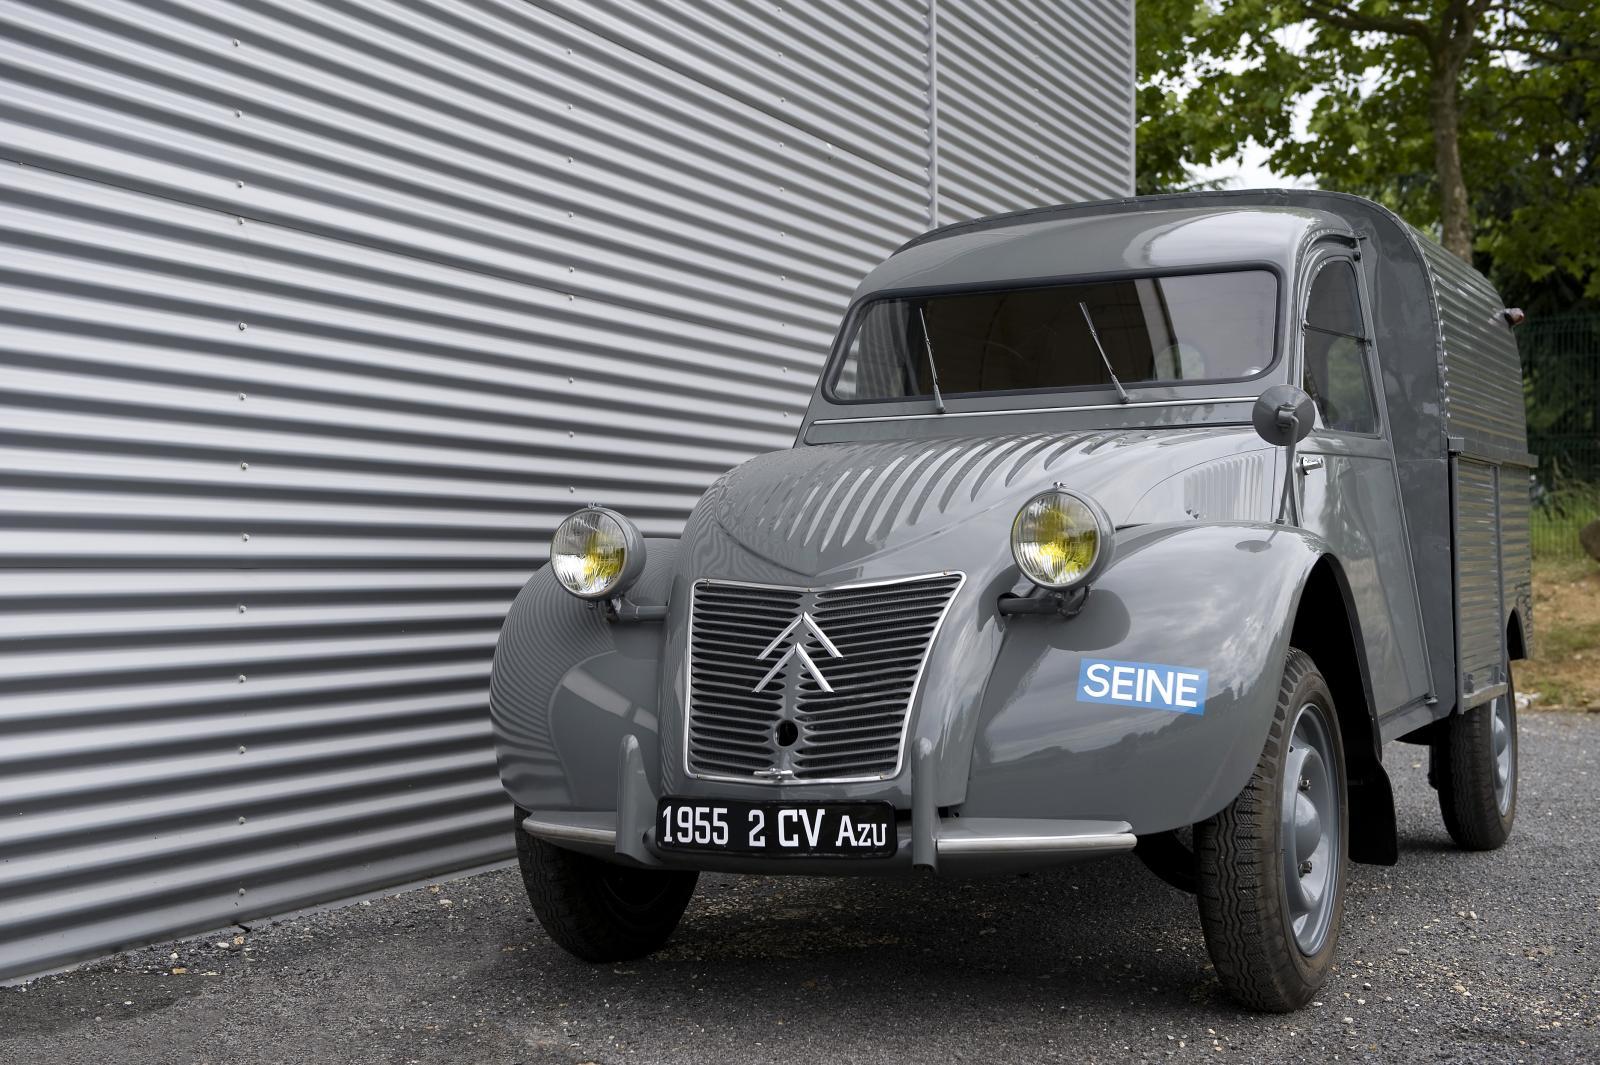 2CV AZU 1955